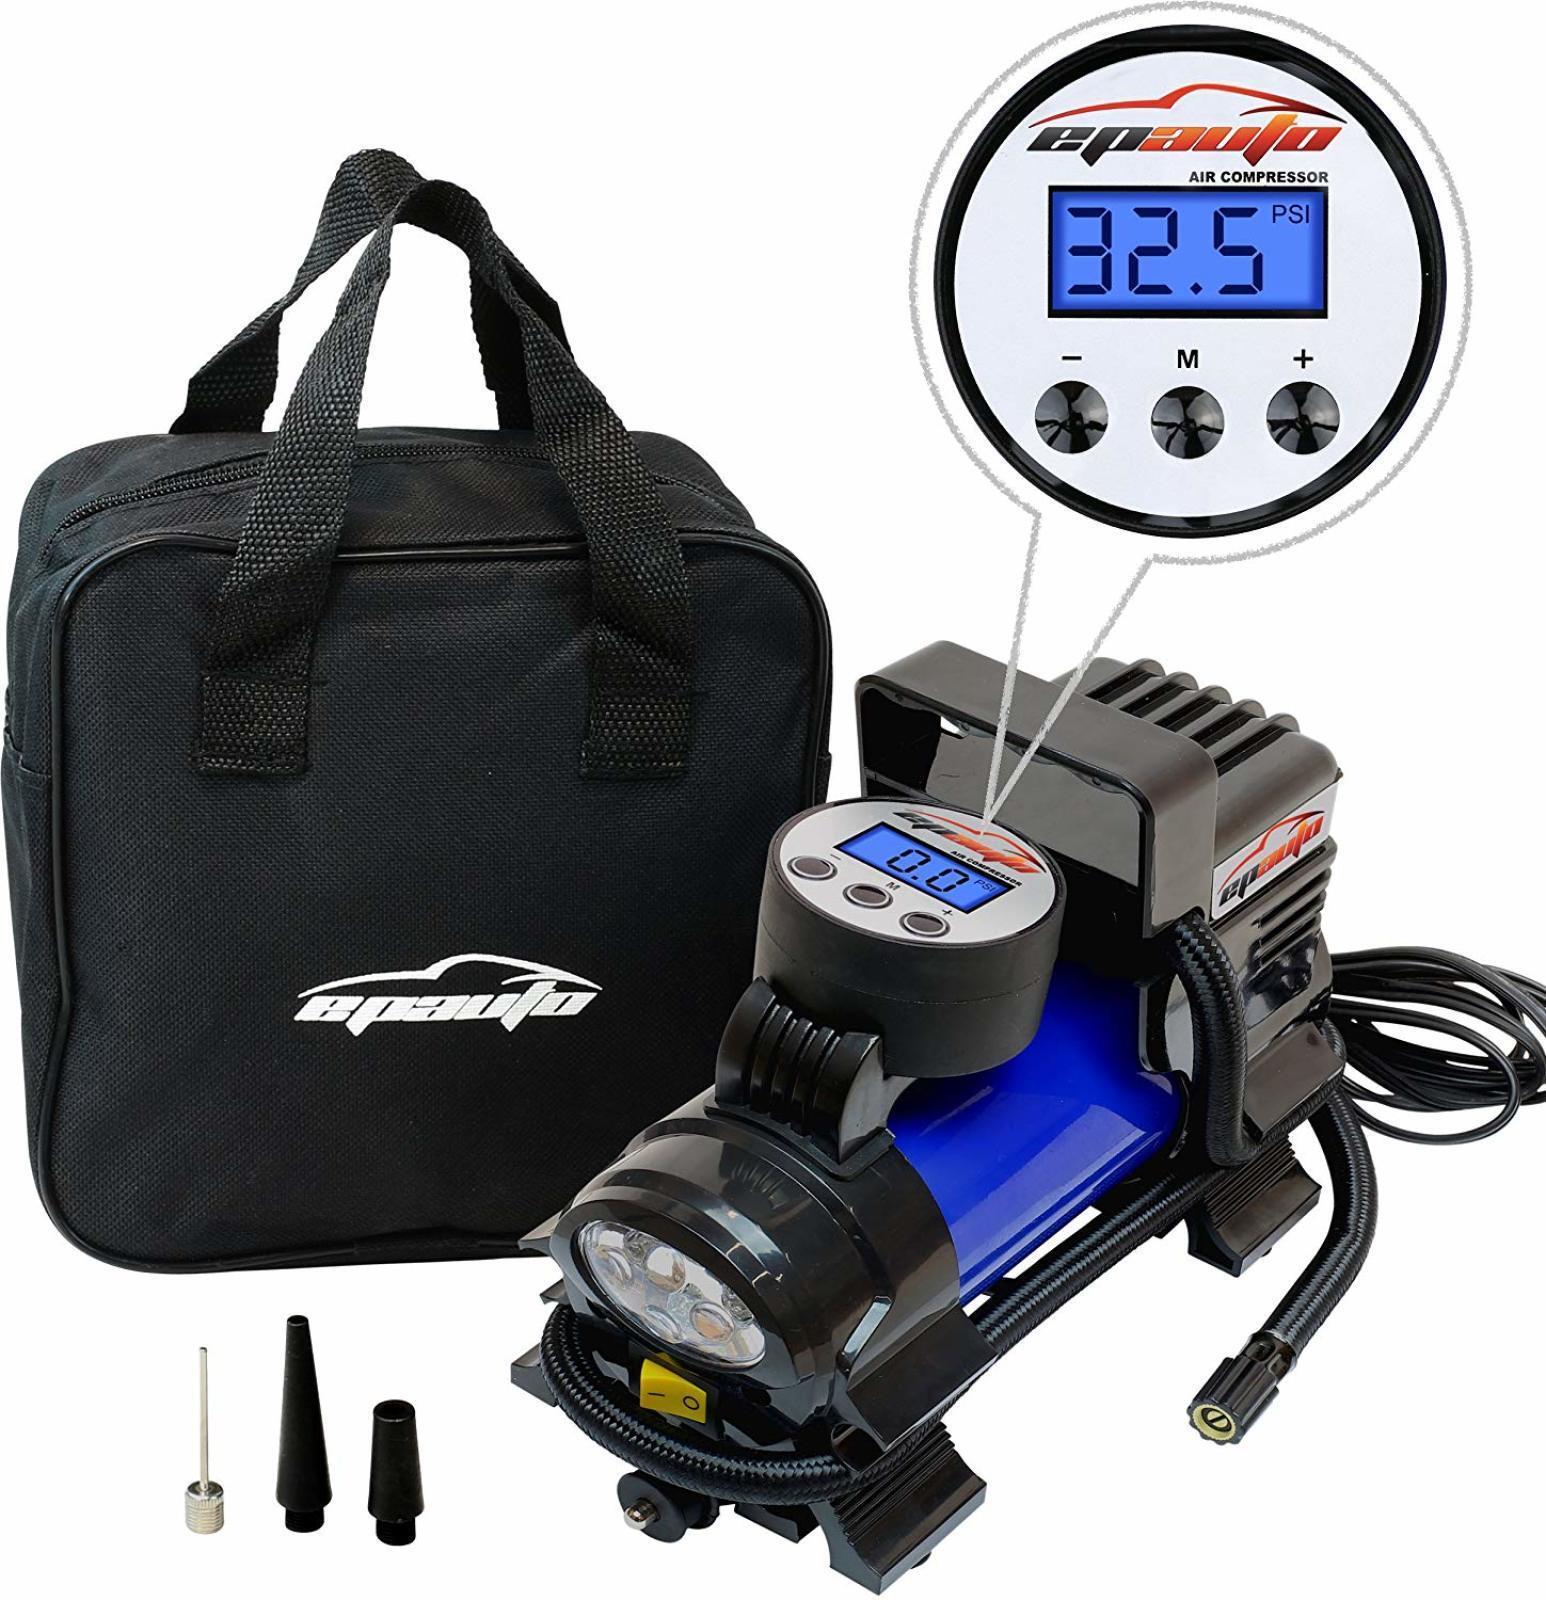 12V DC Portable Air Compressor Pump, Digital Tire Inflator by 100 PSI bluee New..